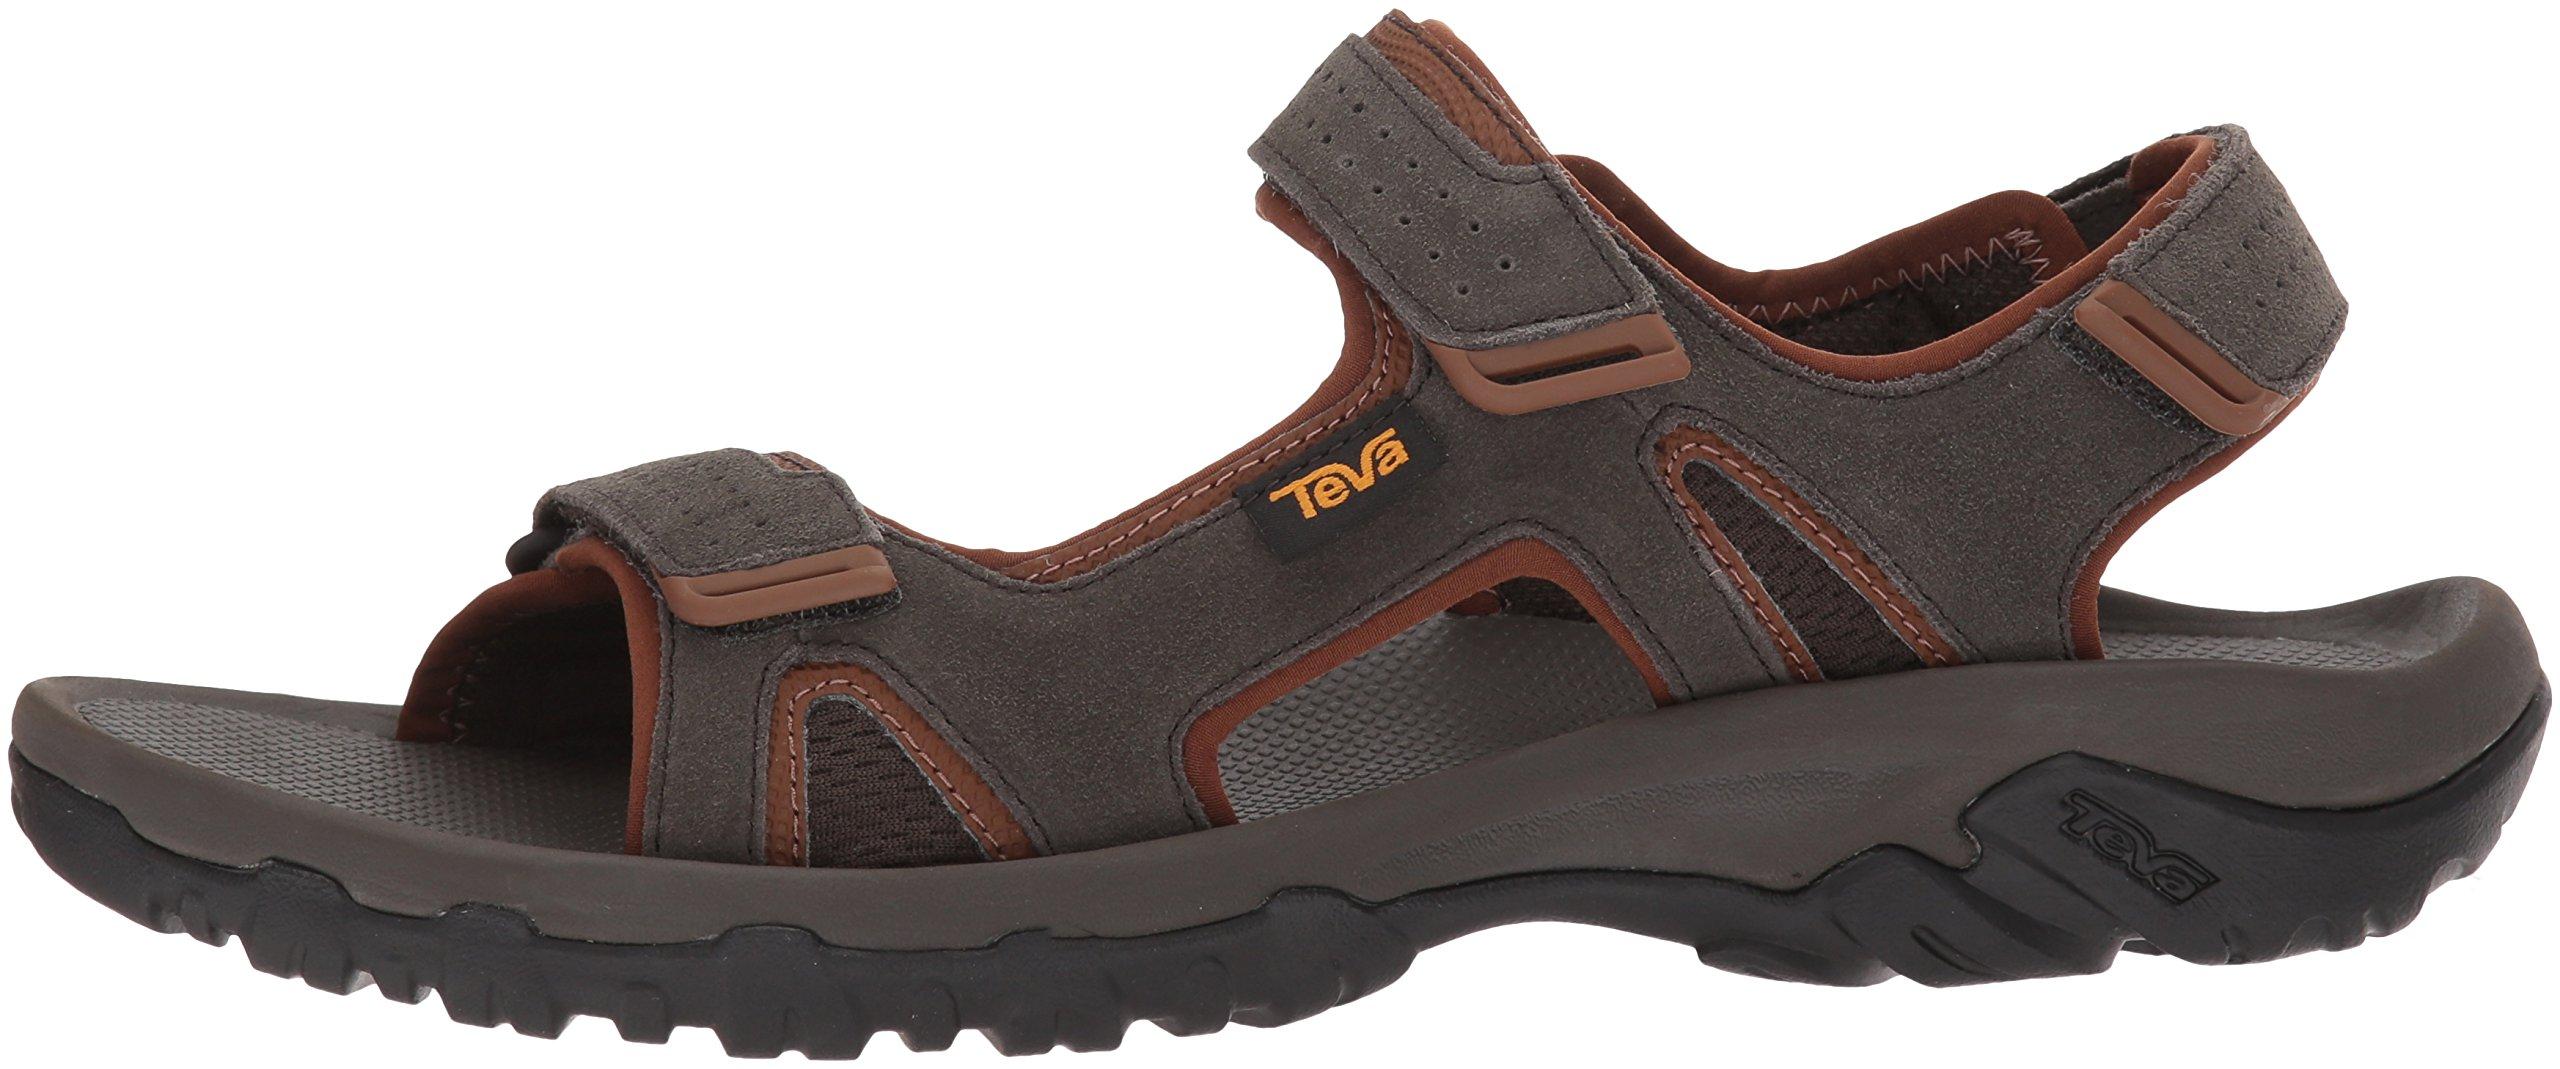 Teva Men's Katavi Outdoor Sandal- Buy